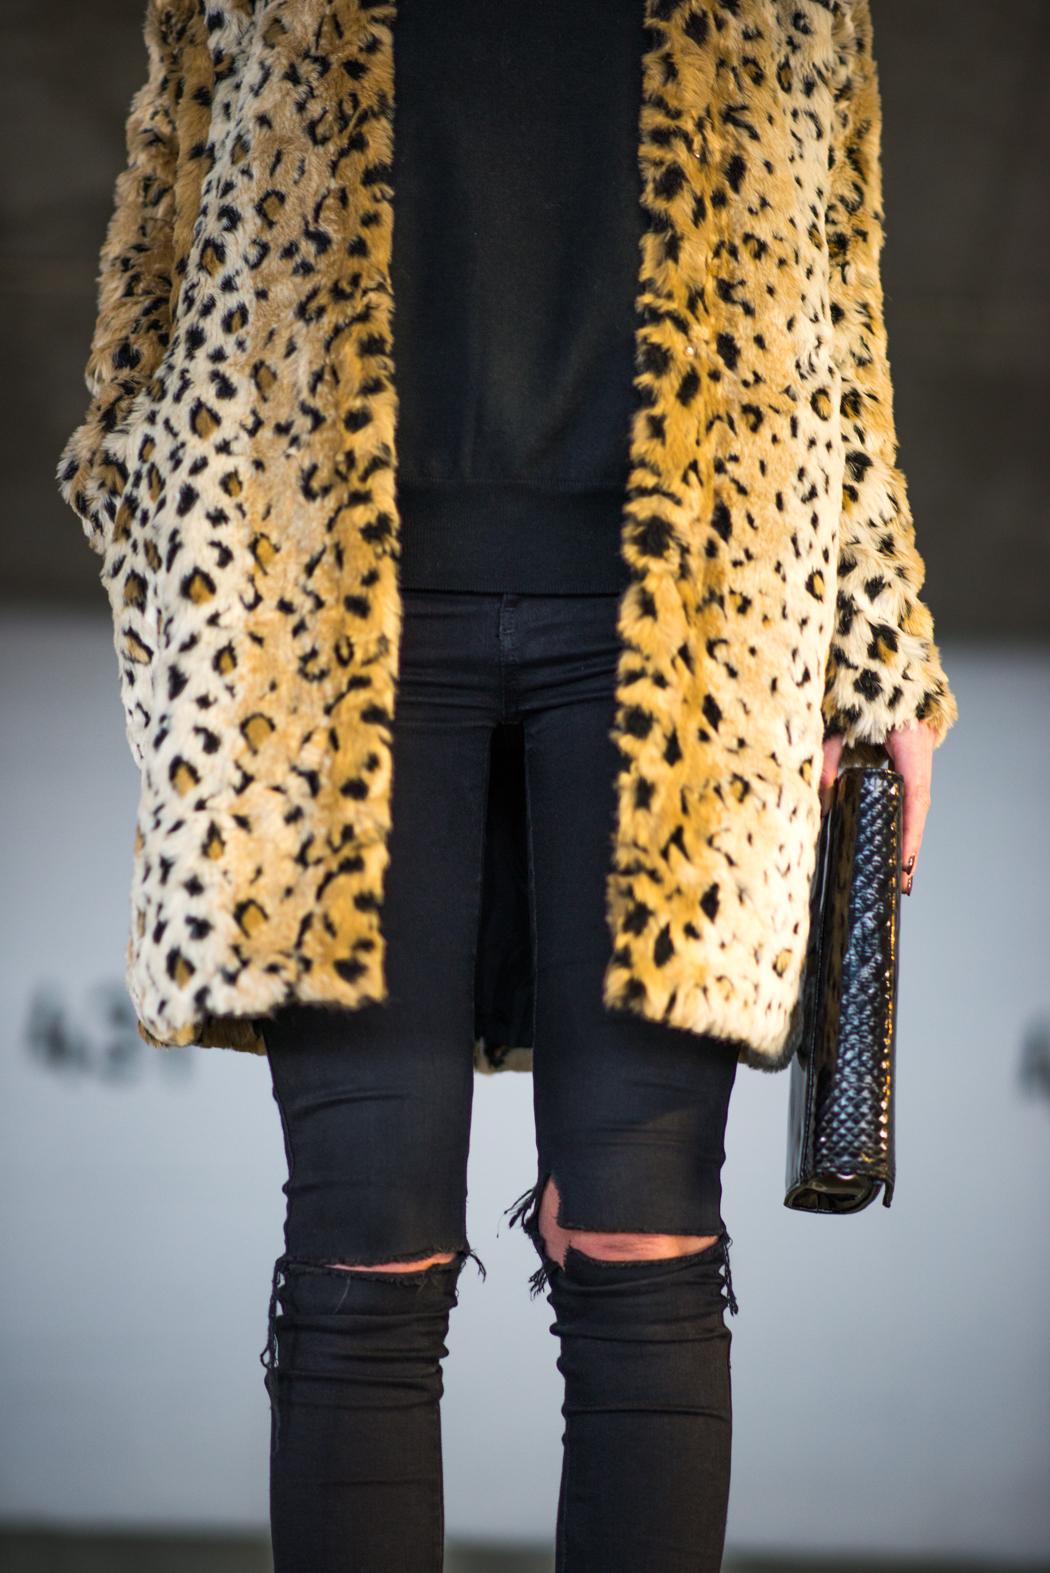 Leomantel-Ripped-Diesel-Jeans-Fashionblogger-Lindarella-8